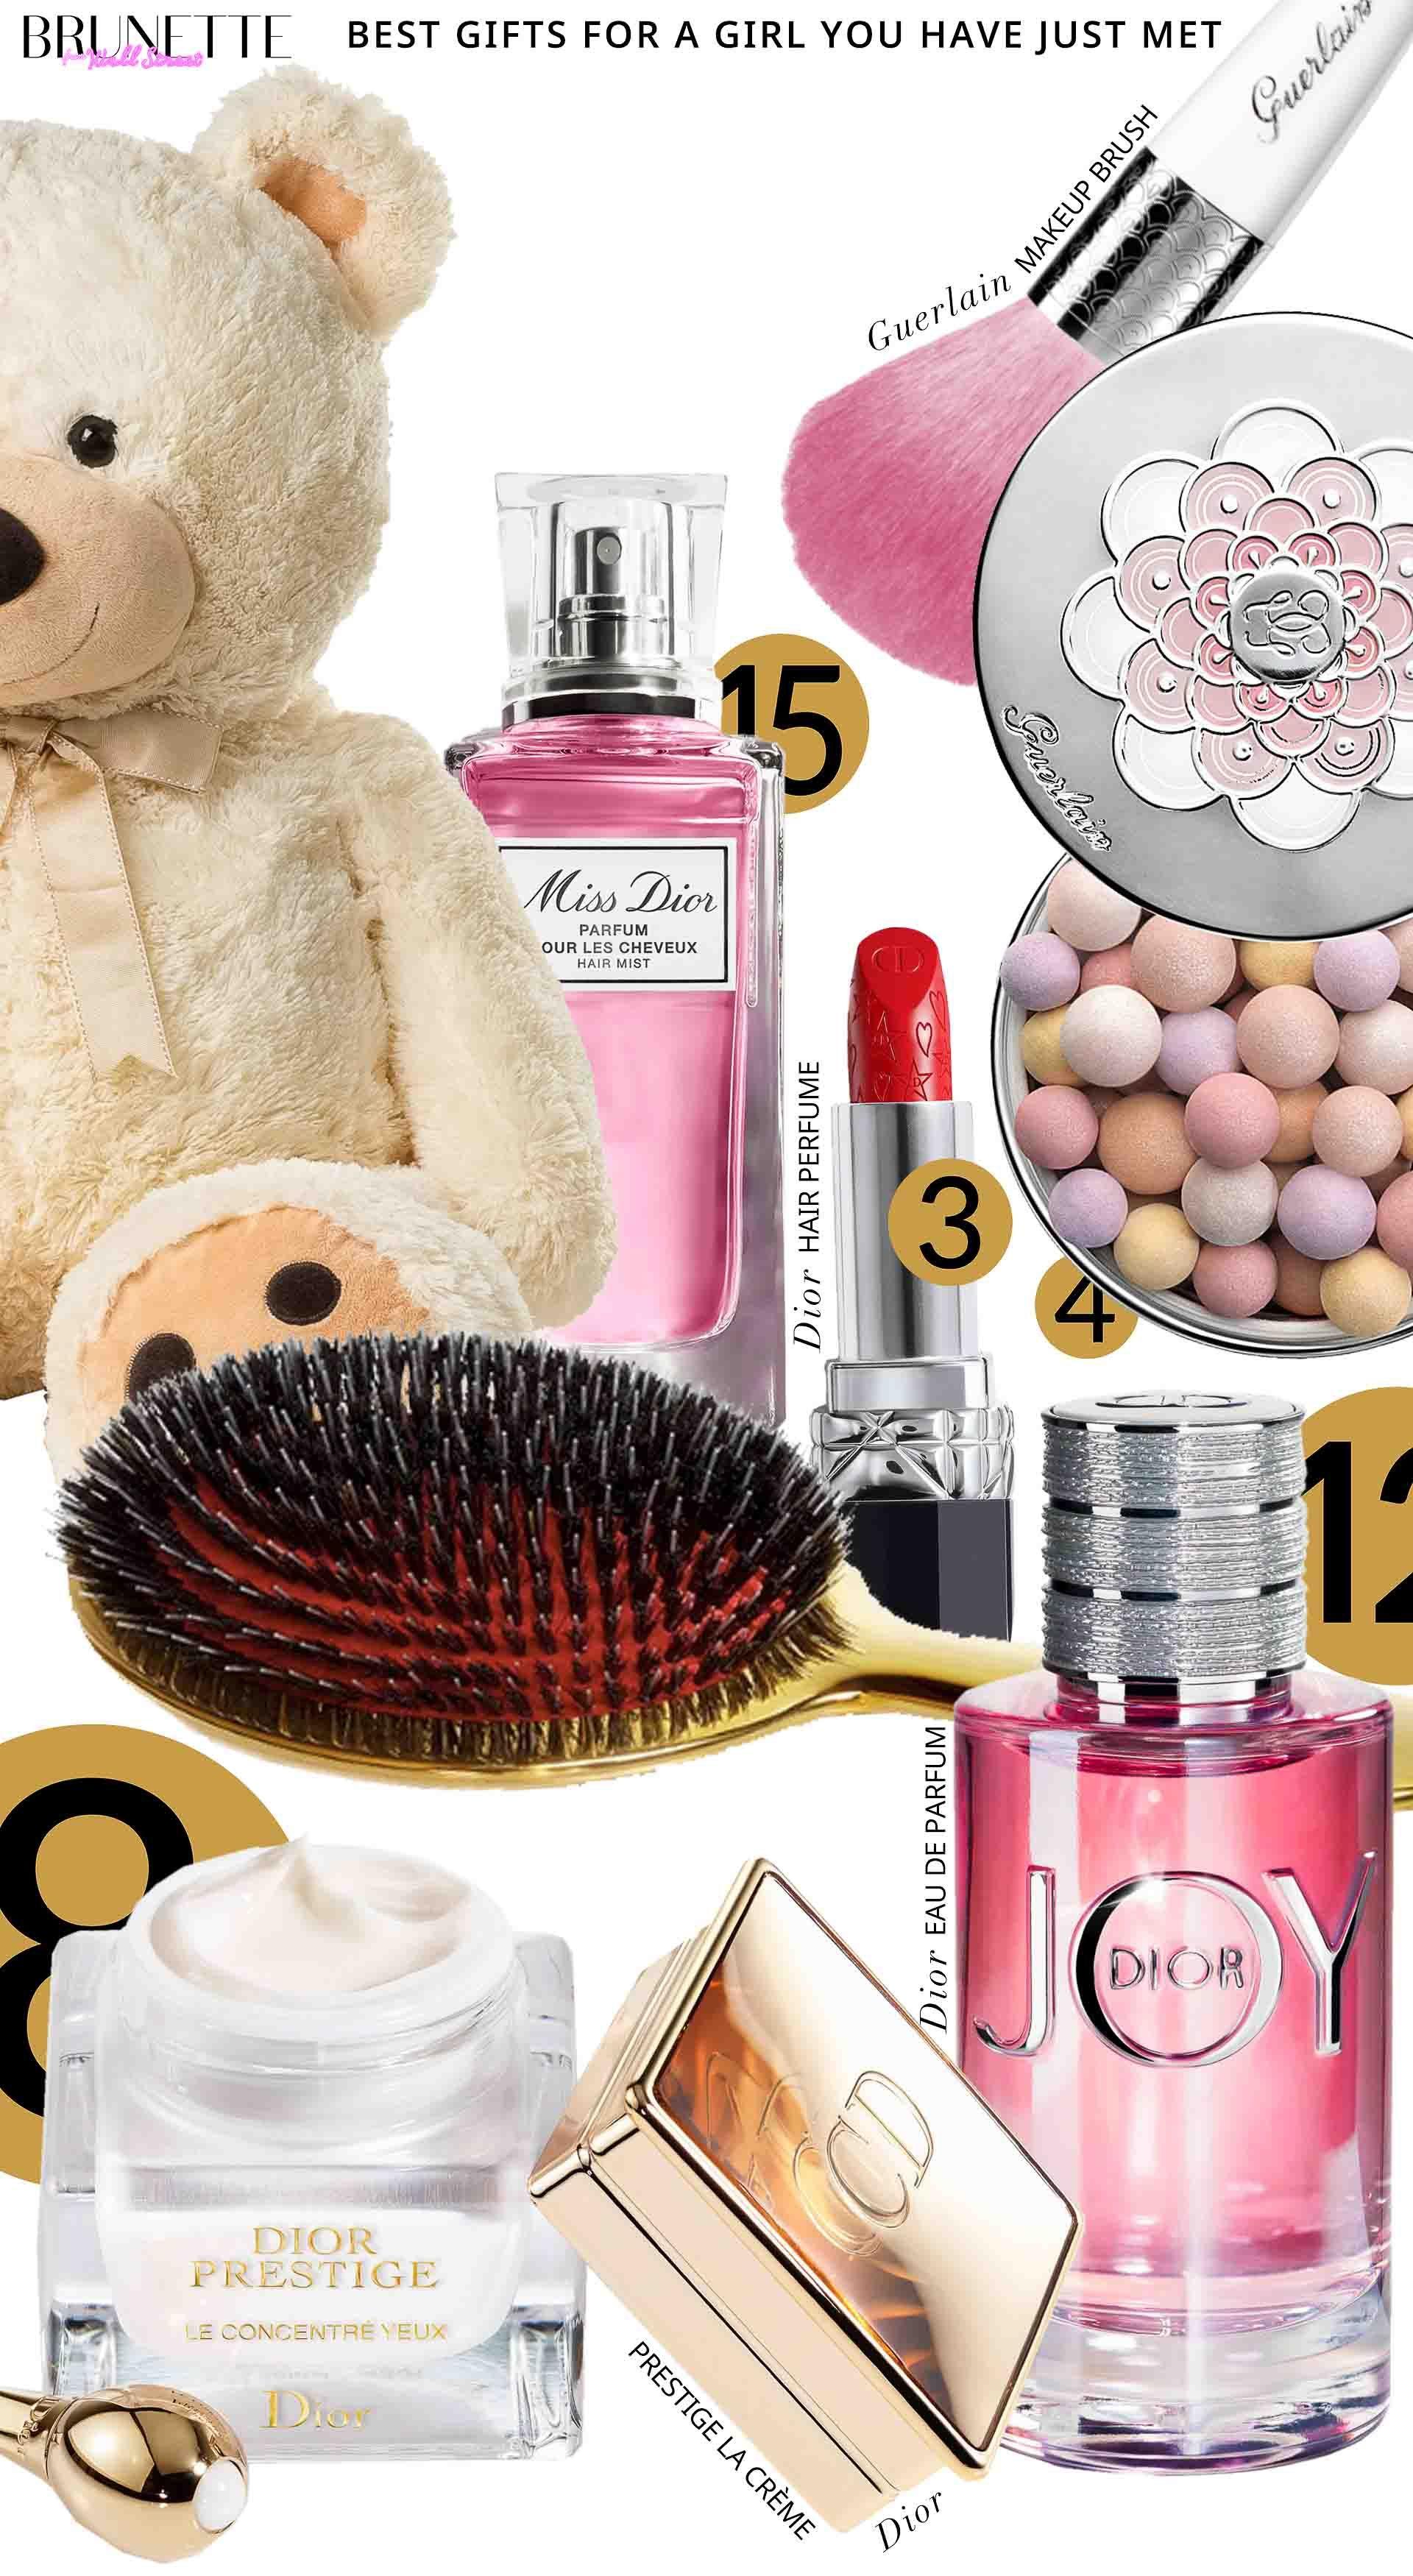 METEORITES LIGHT REVEALING PEARLS OF POWDER Guerlain Balmain Gold Brush Joy Dior Perfume Prestige Cream Miss Hair Mist Limited